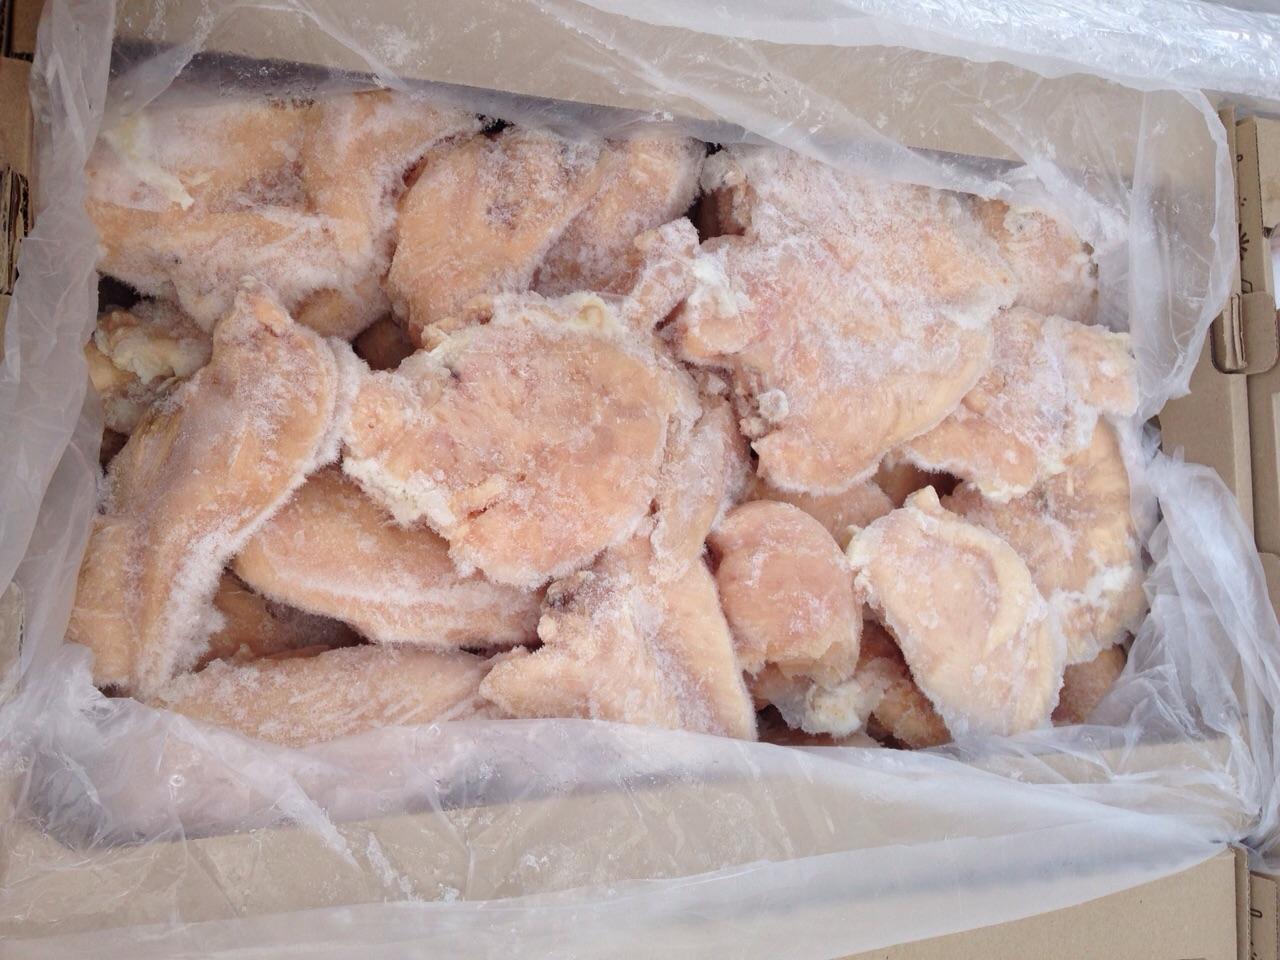 Мясо Филе Грудки ЦБ, весовое, Для жарки, заморозка